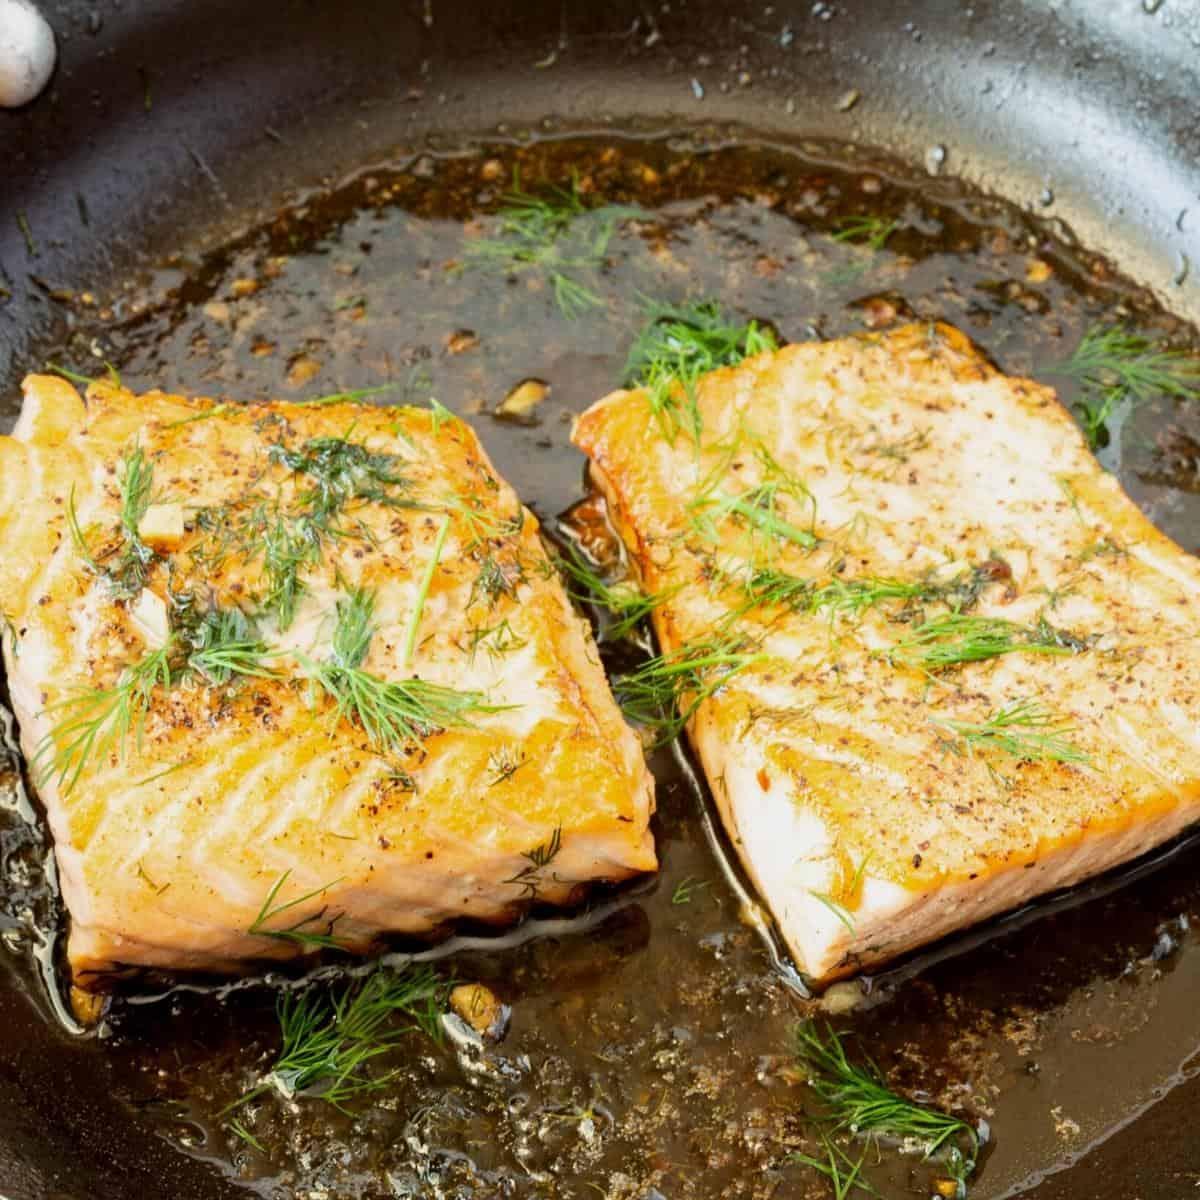 A saute pan with sautéed salmon.